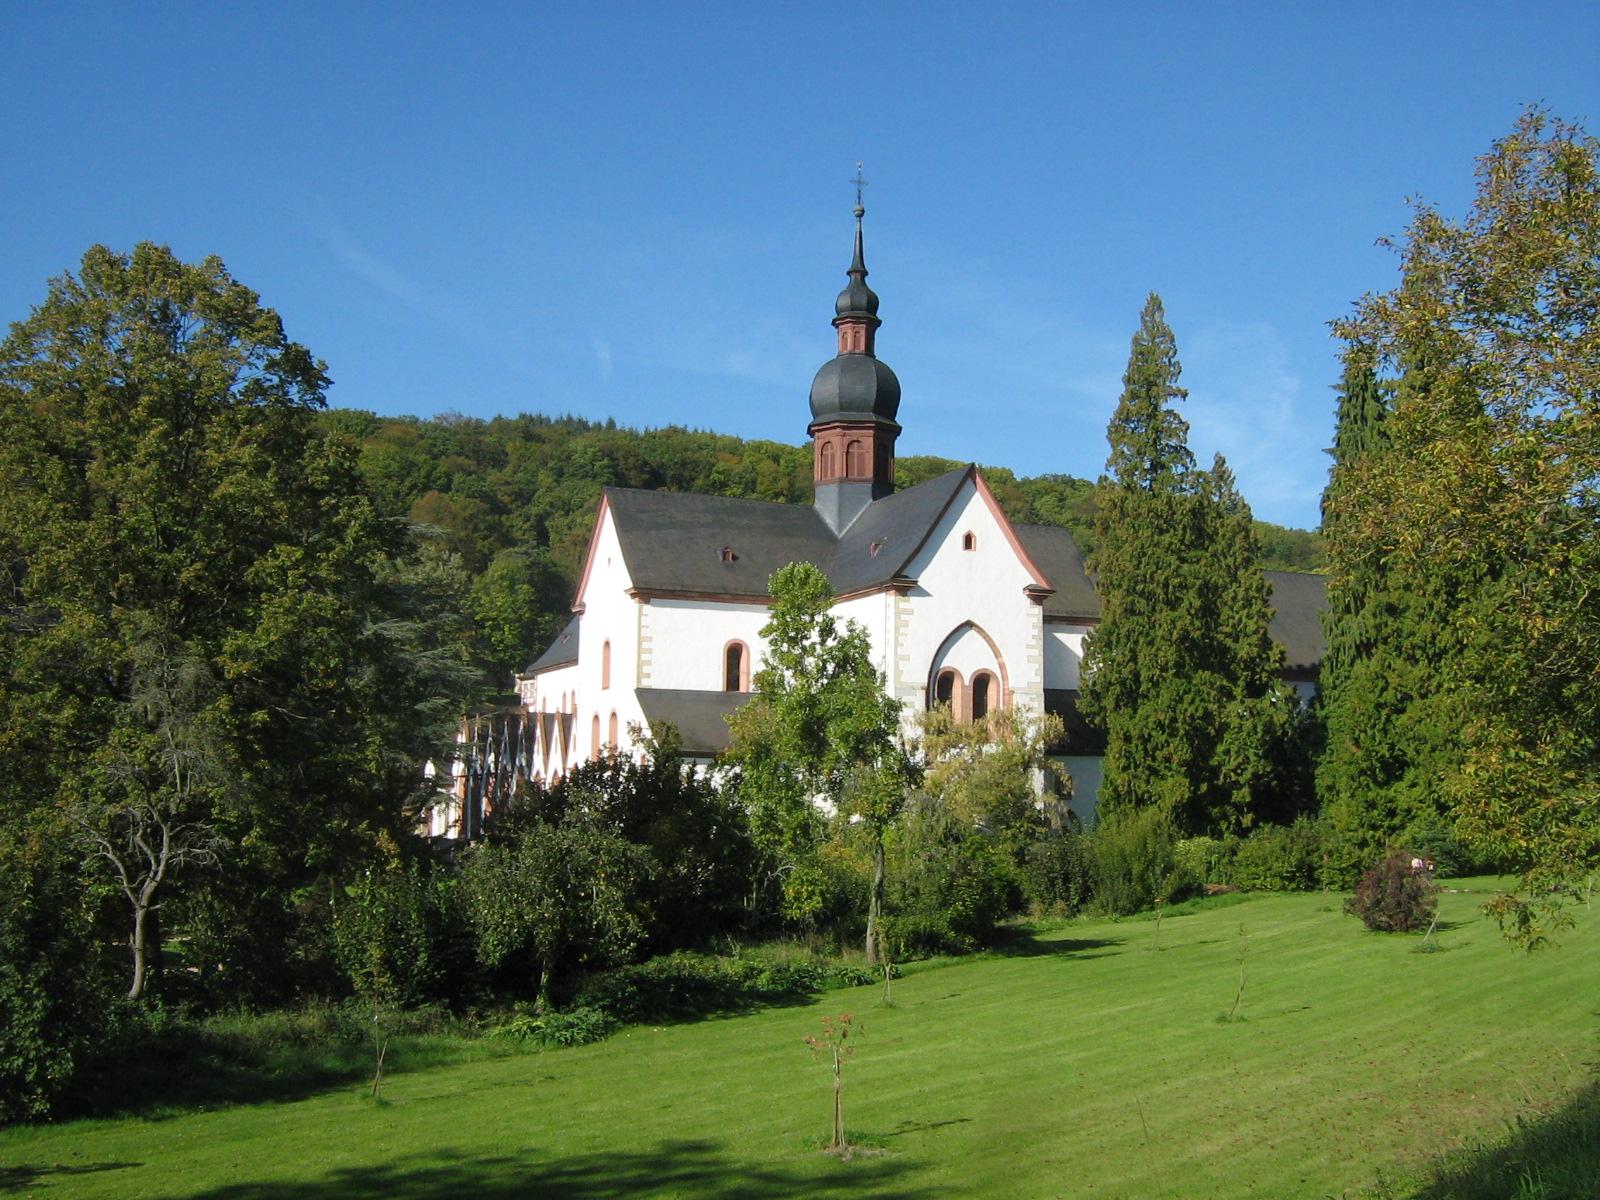 monastère d'eberbach